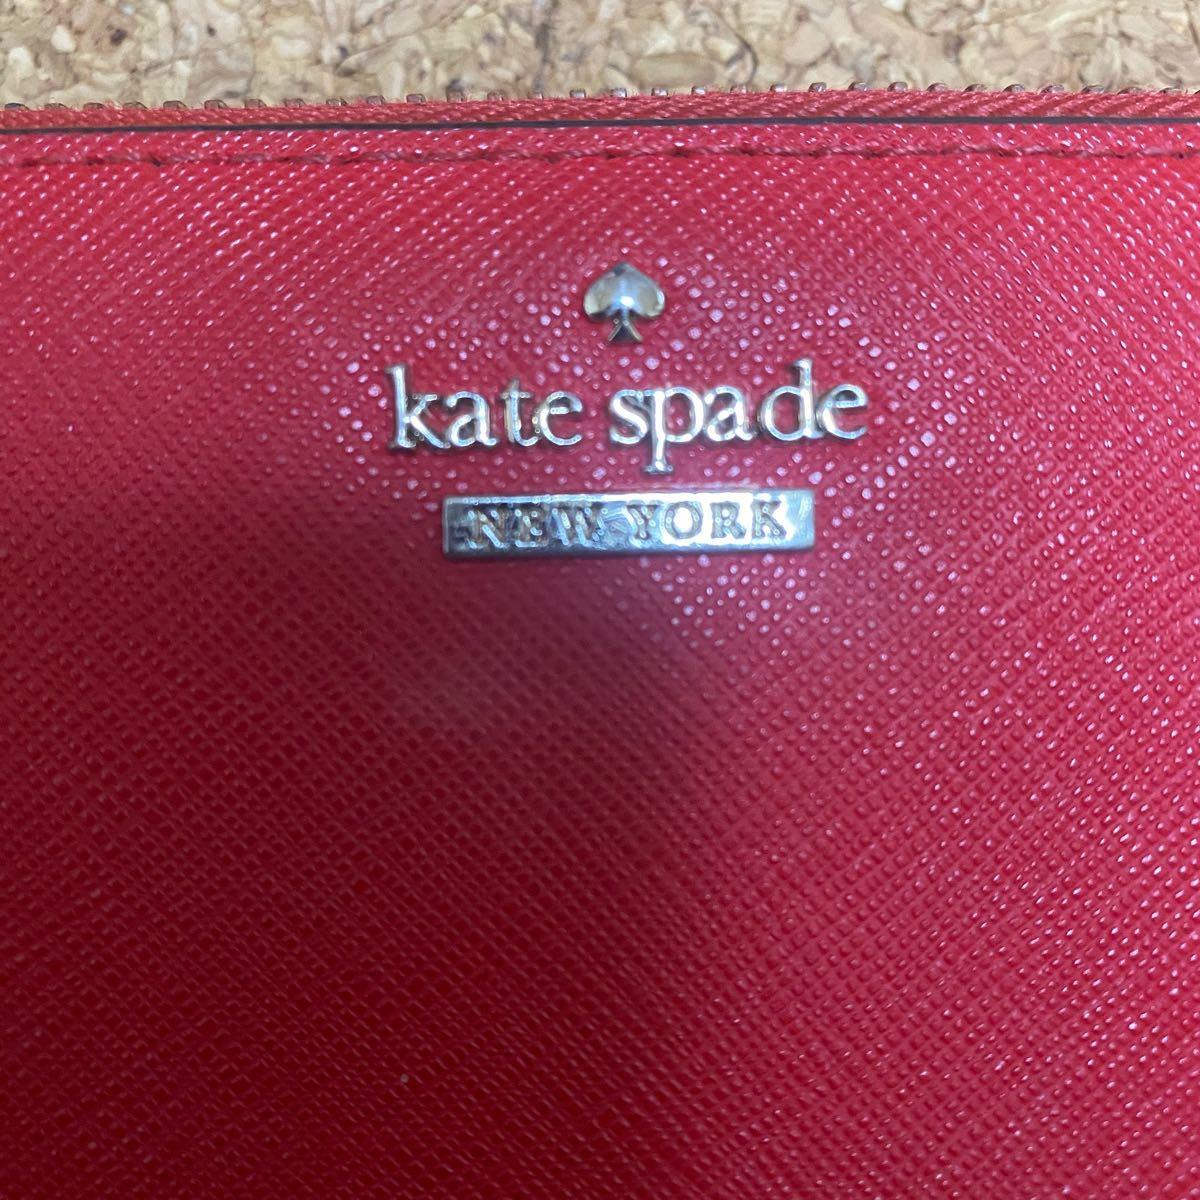 Kate spade ケイトスペード 長財布